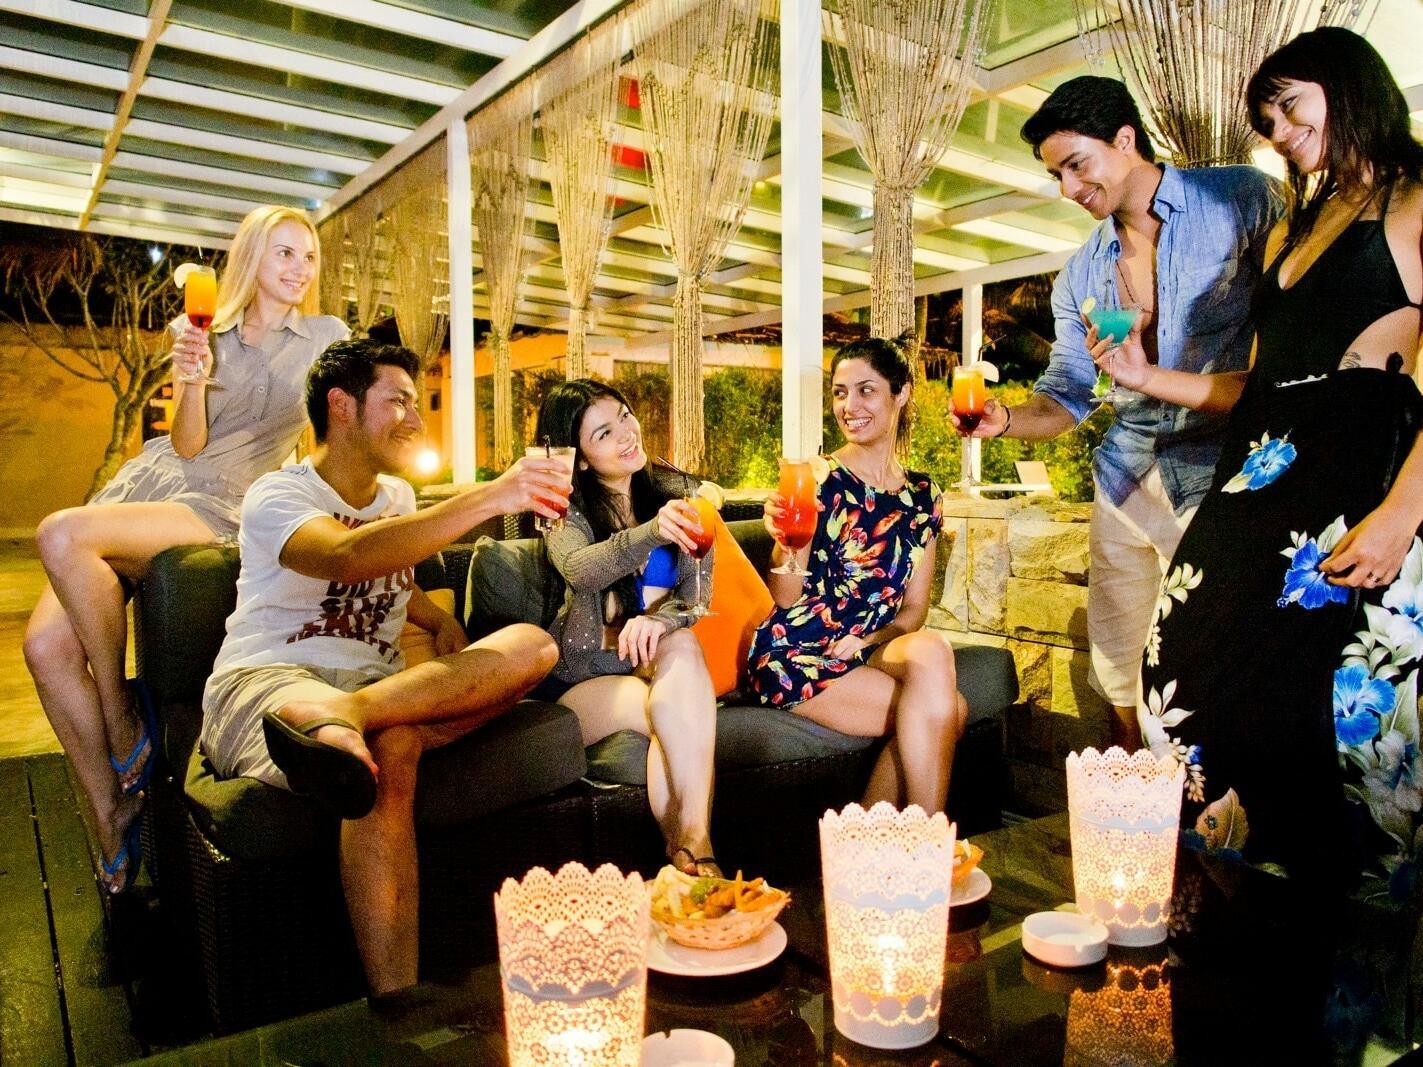 People enjoying drinks at the Cumulus Restaurant